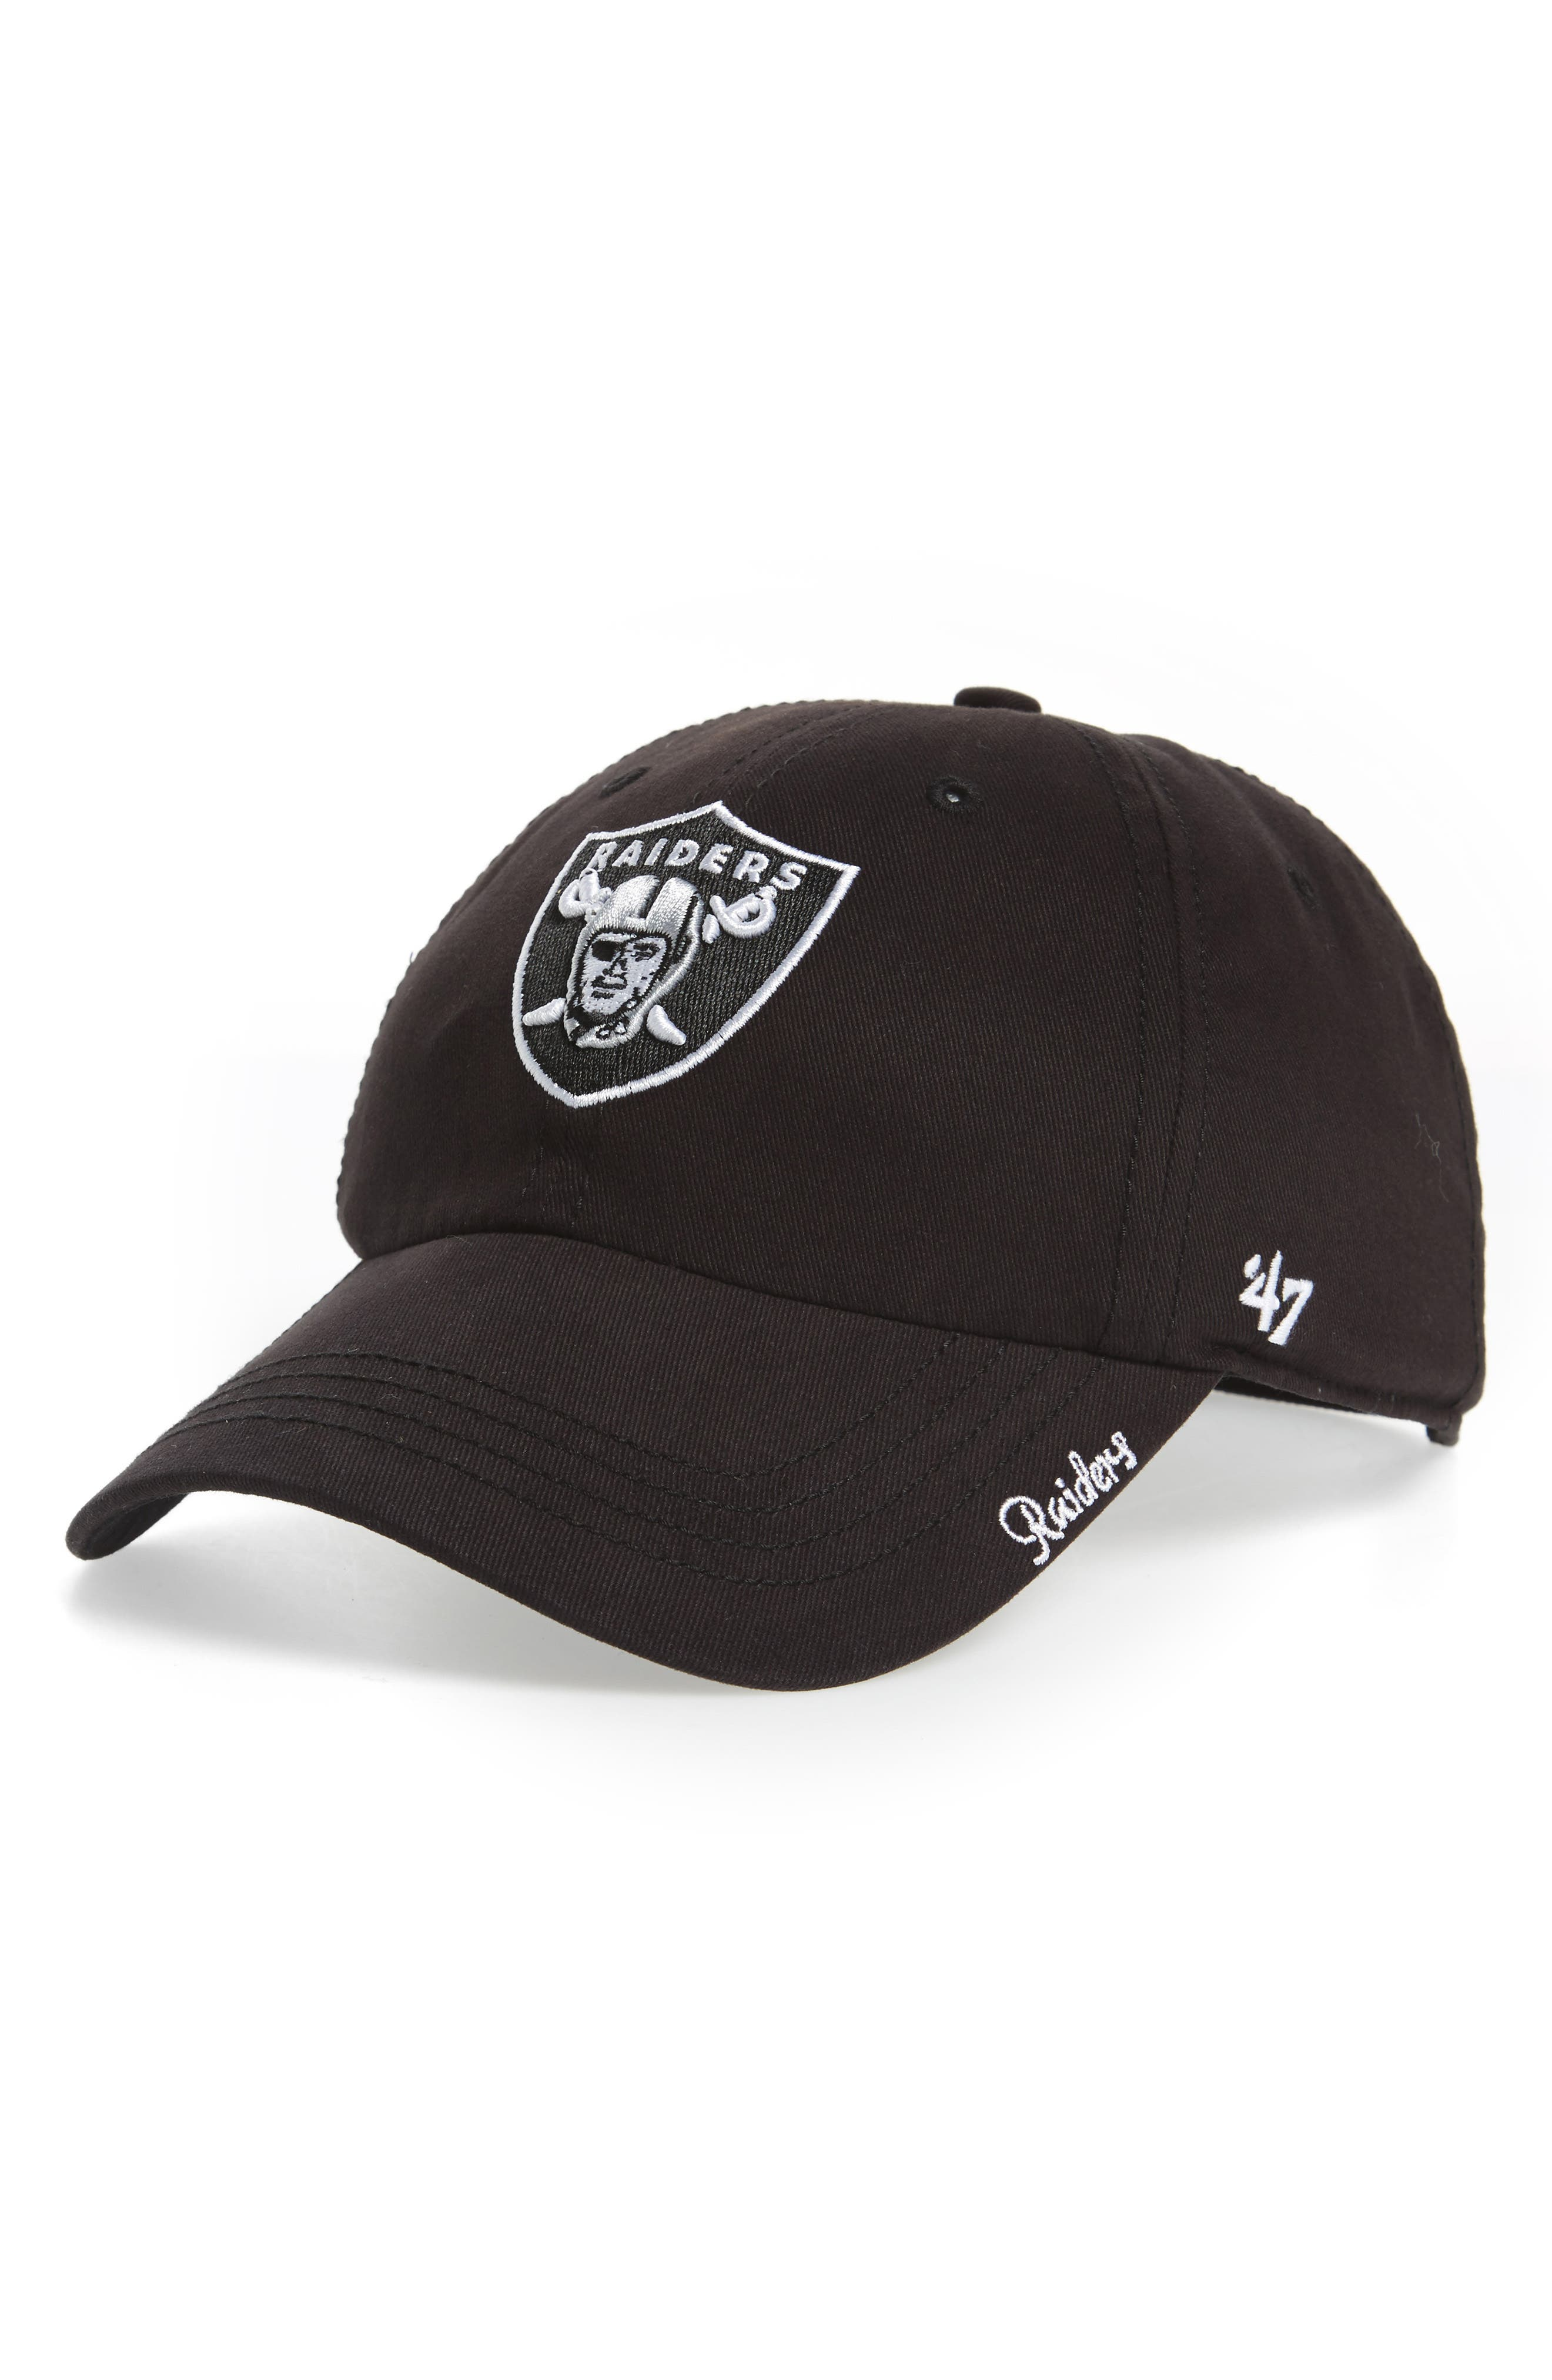 Miata Clean Up Oakland Raiders Ball Cap,                             Main thumbnail 1, color,                             001